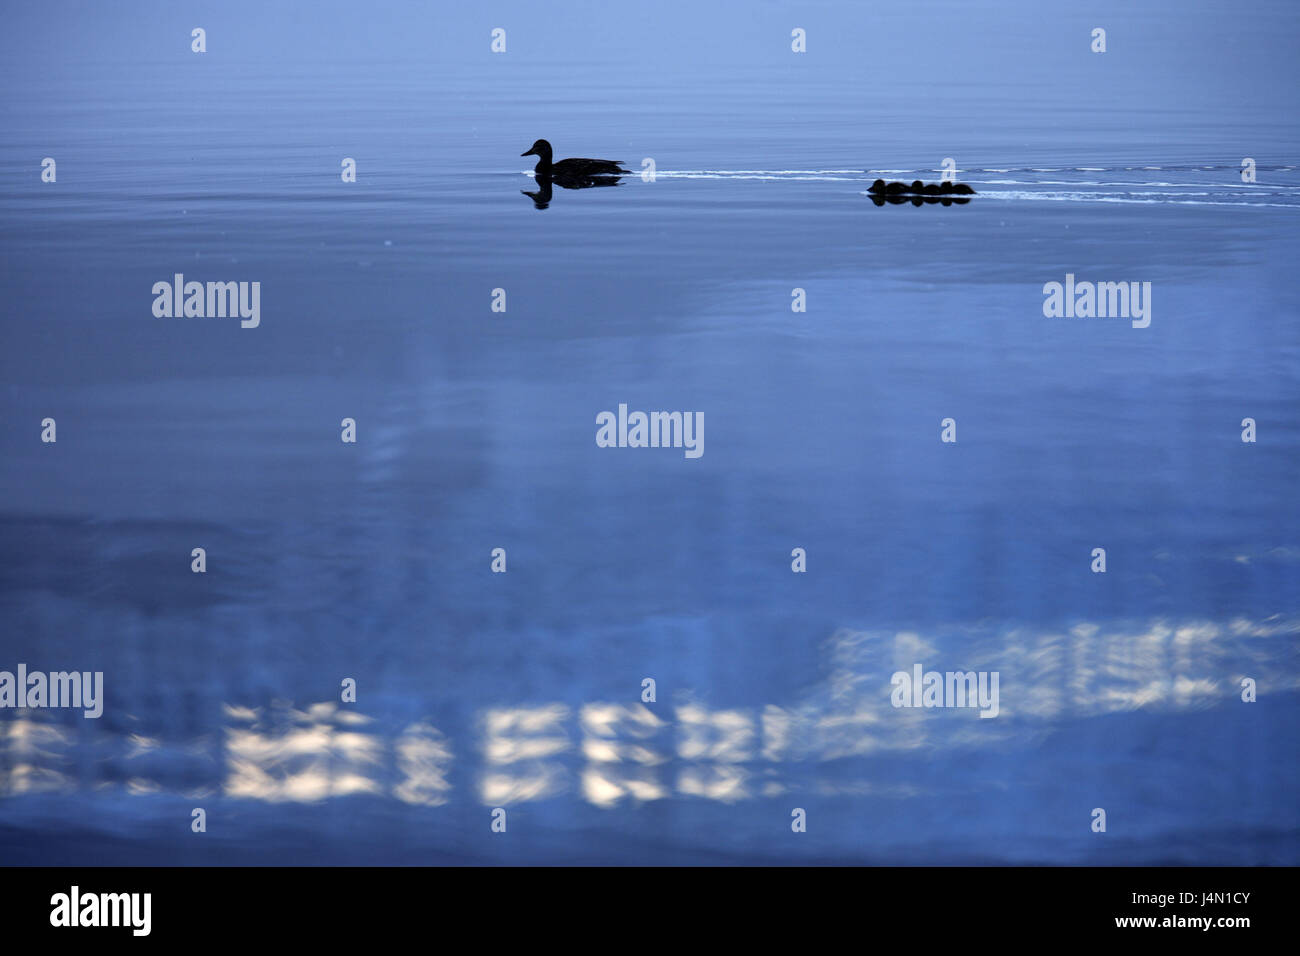 The USA, Alaska, Juneau, Mendenhall brine, silhouette, ducks, - Stock Image